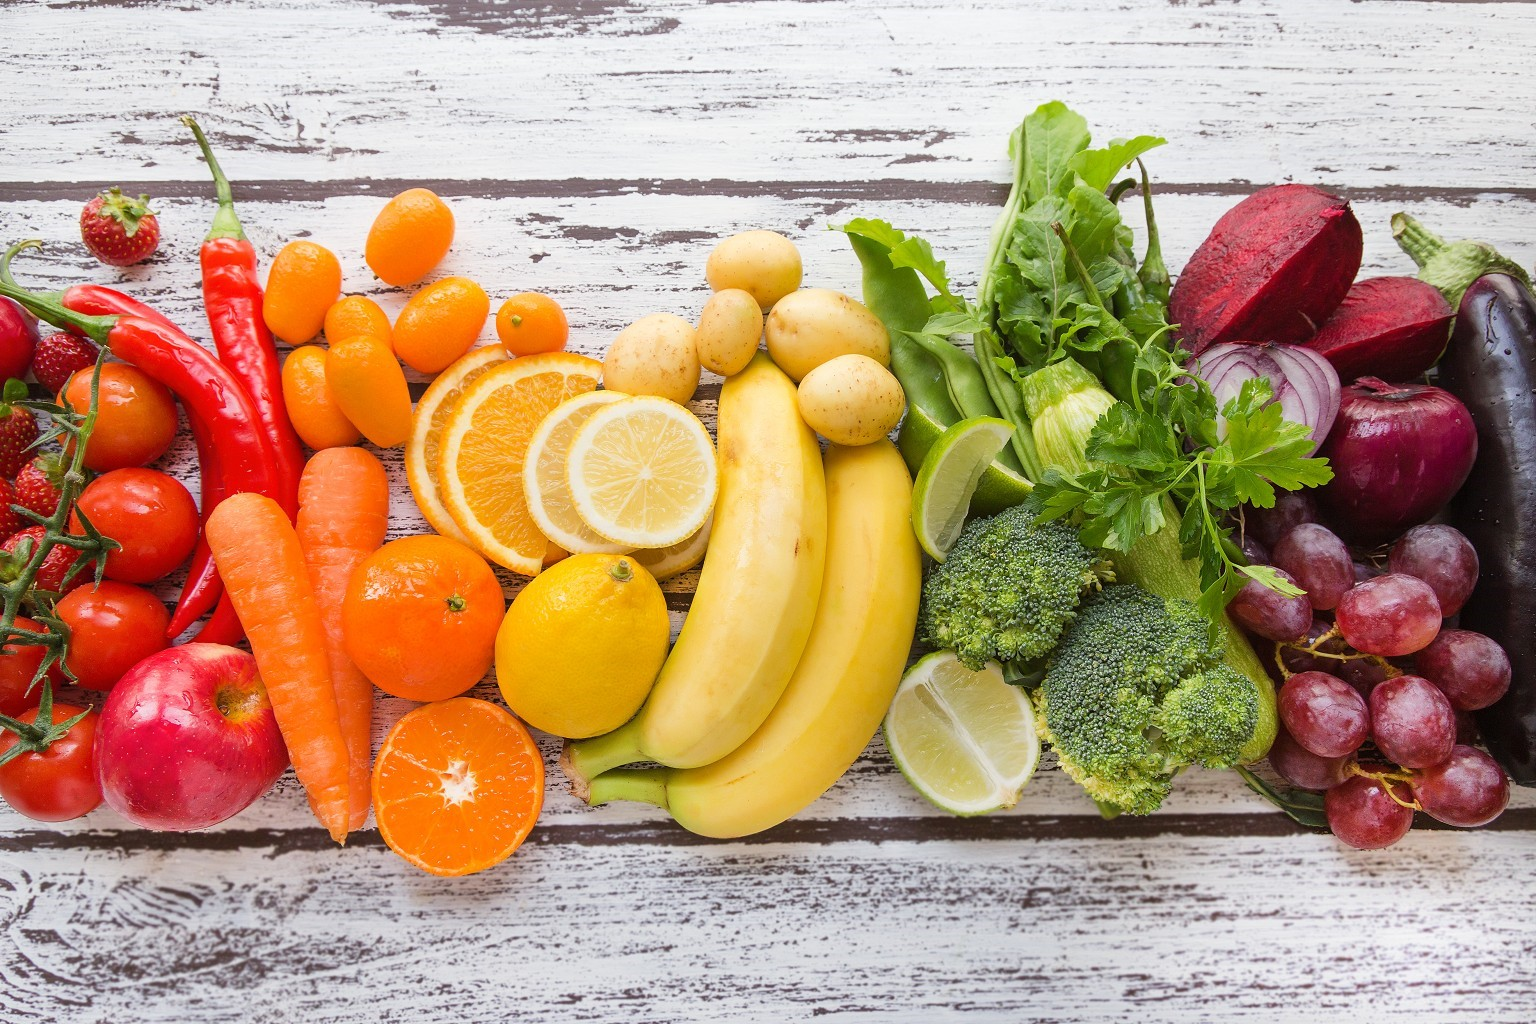 Hoeveel groente en fruit heb je nodig per dag?